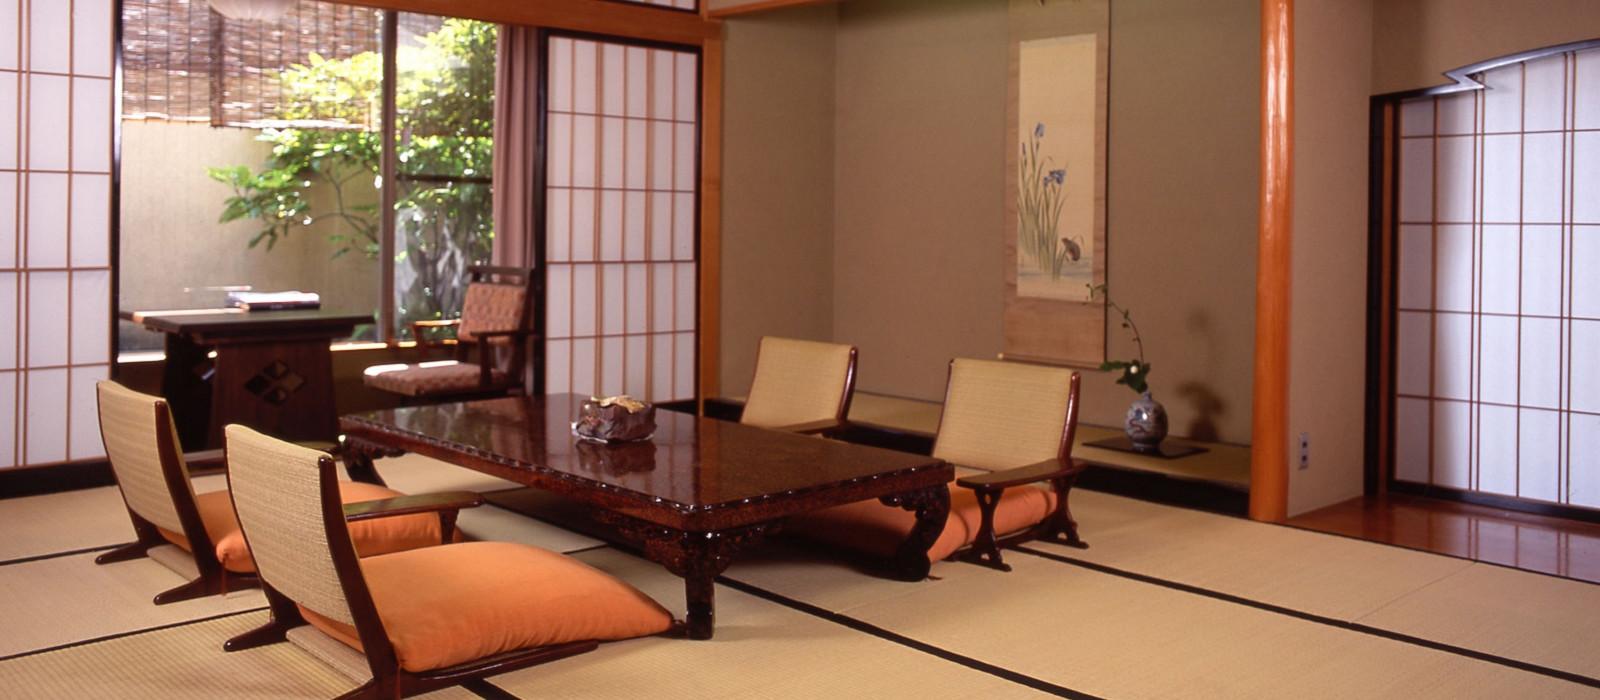 Hotel Asadaya Ryokan Japan